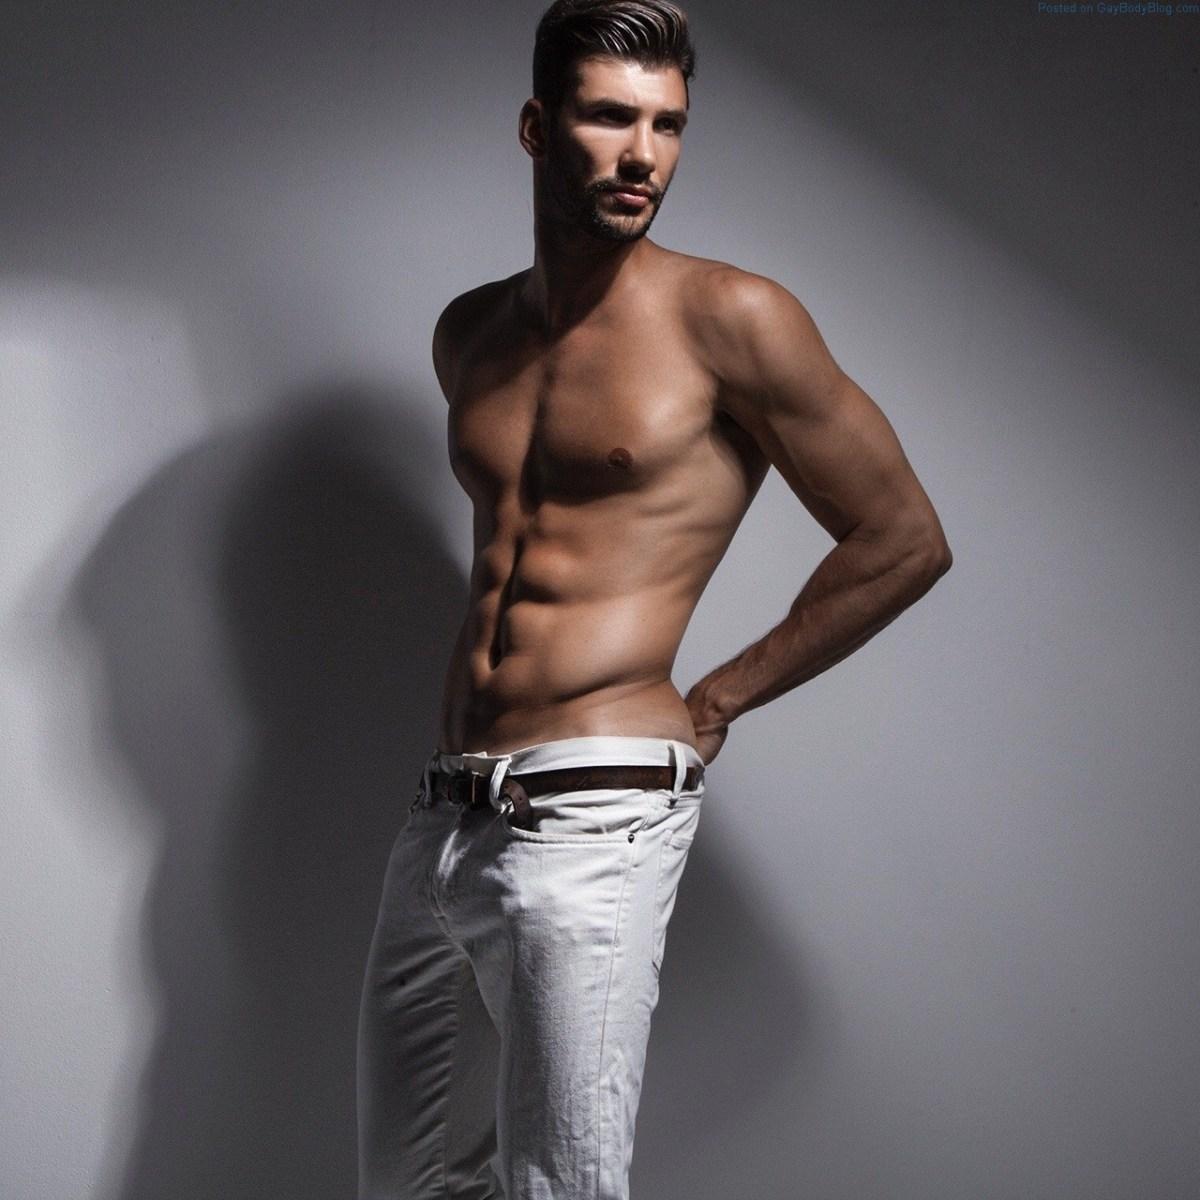 We Need More Gorgeous Ukrainian Men Like Artur Dainese Around Here